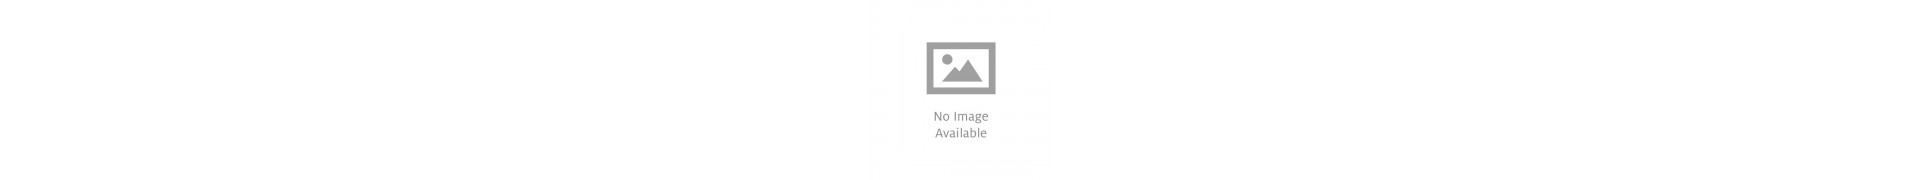 RECHARGE PORTE-GOMME STAEDTLER MARS PLASTIC 528 55